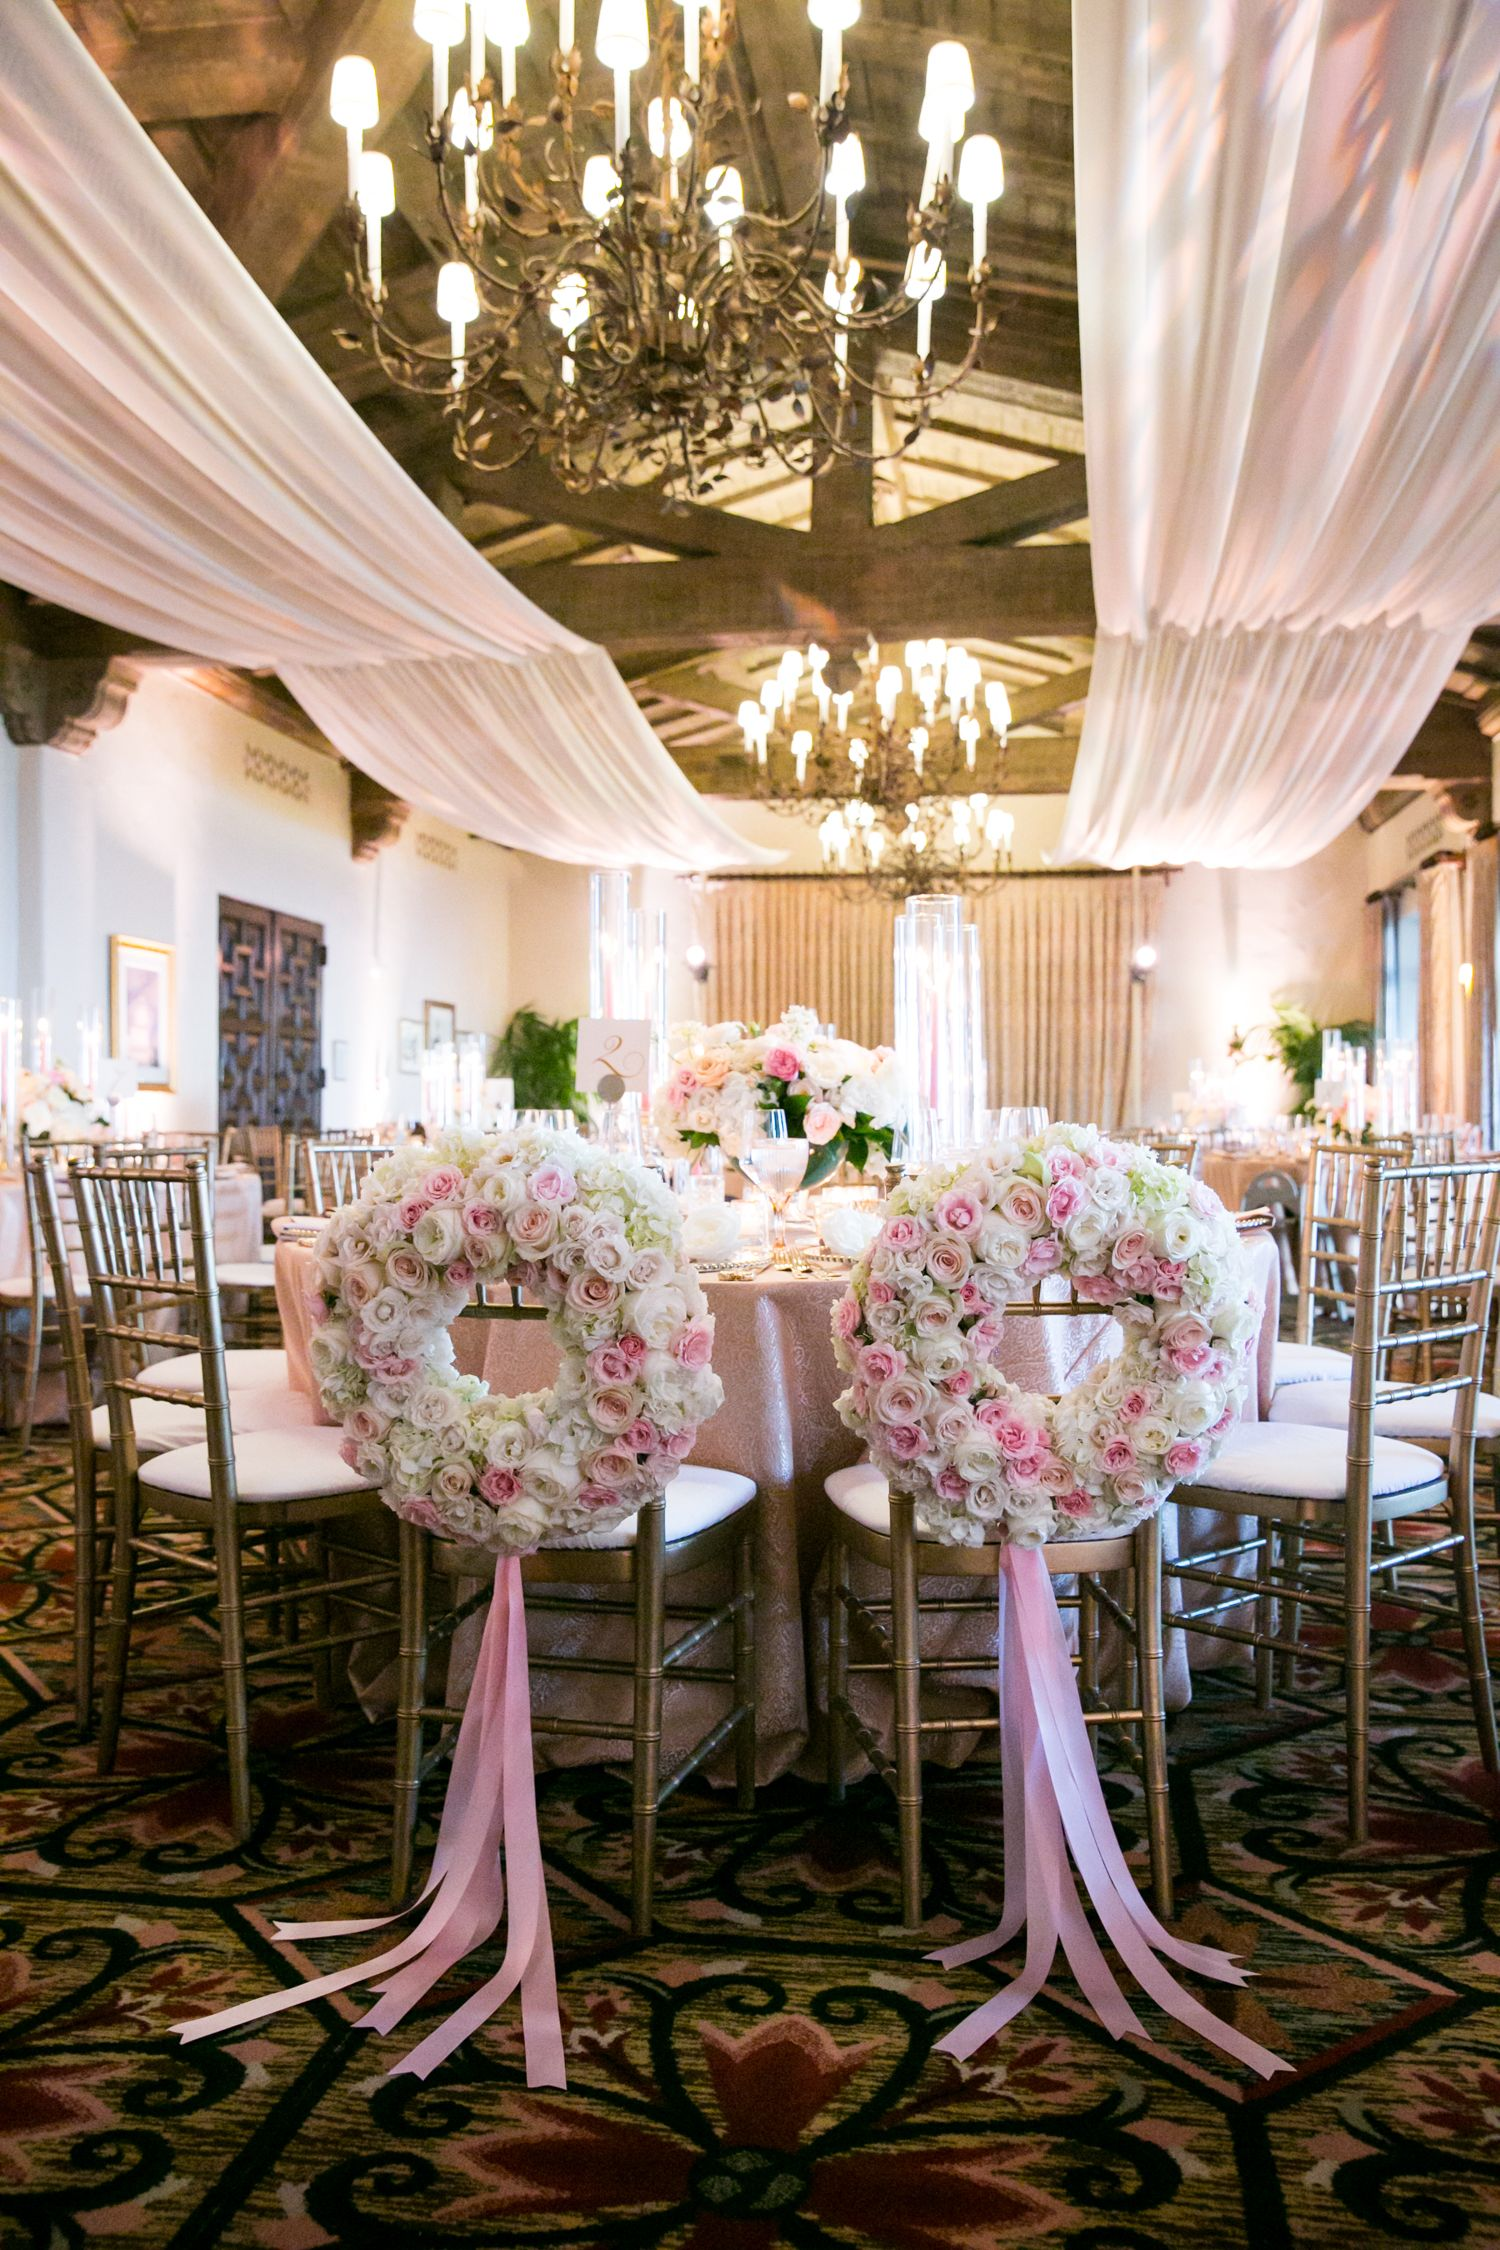 blog design do chair wedding magnolia event matter chairs